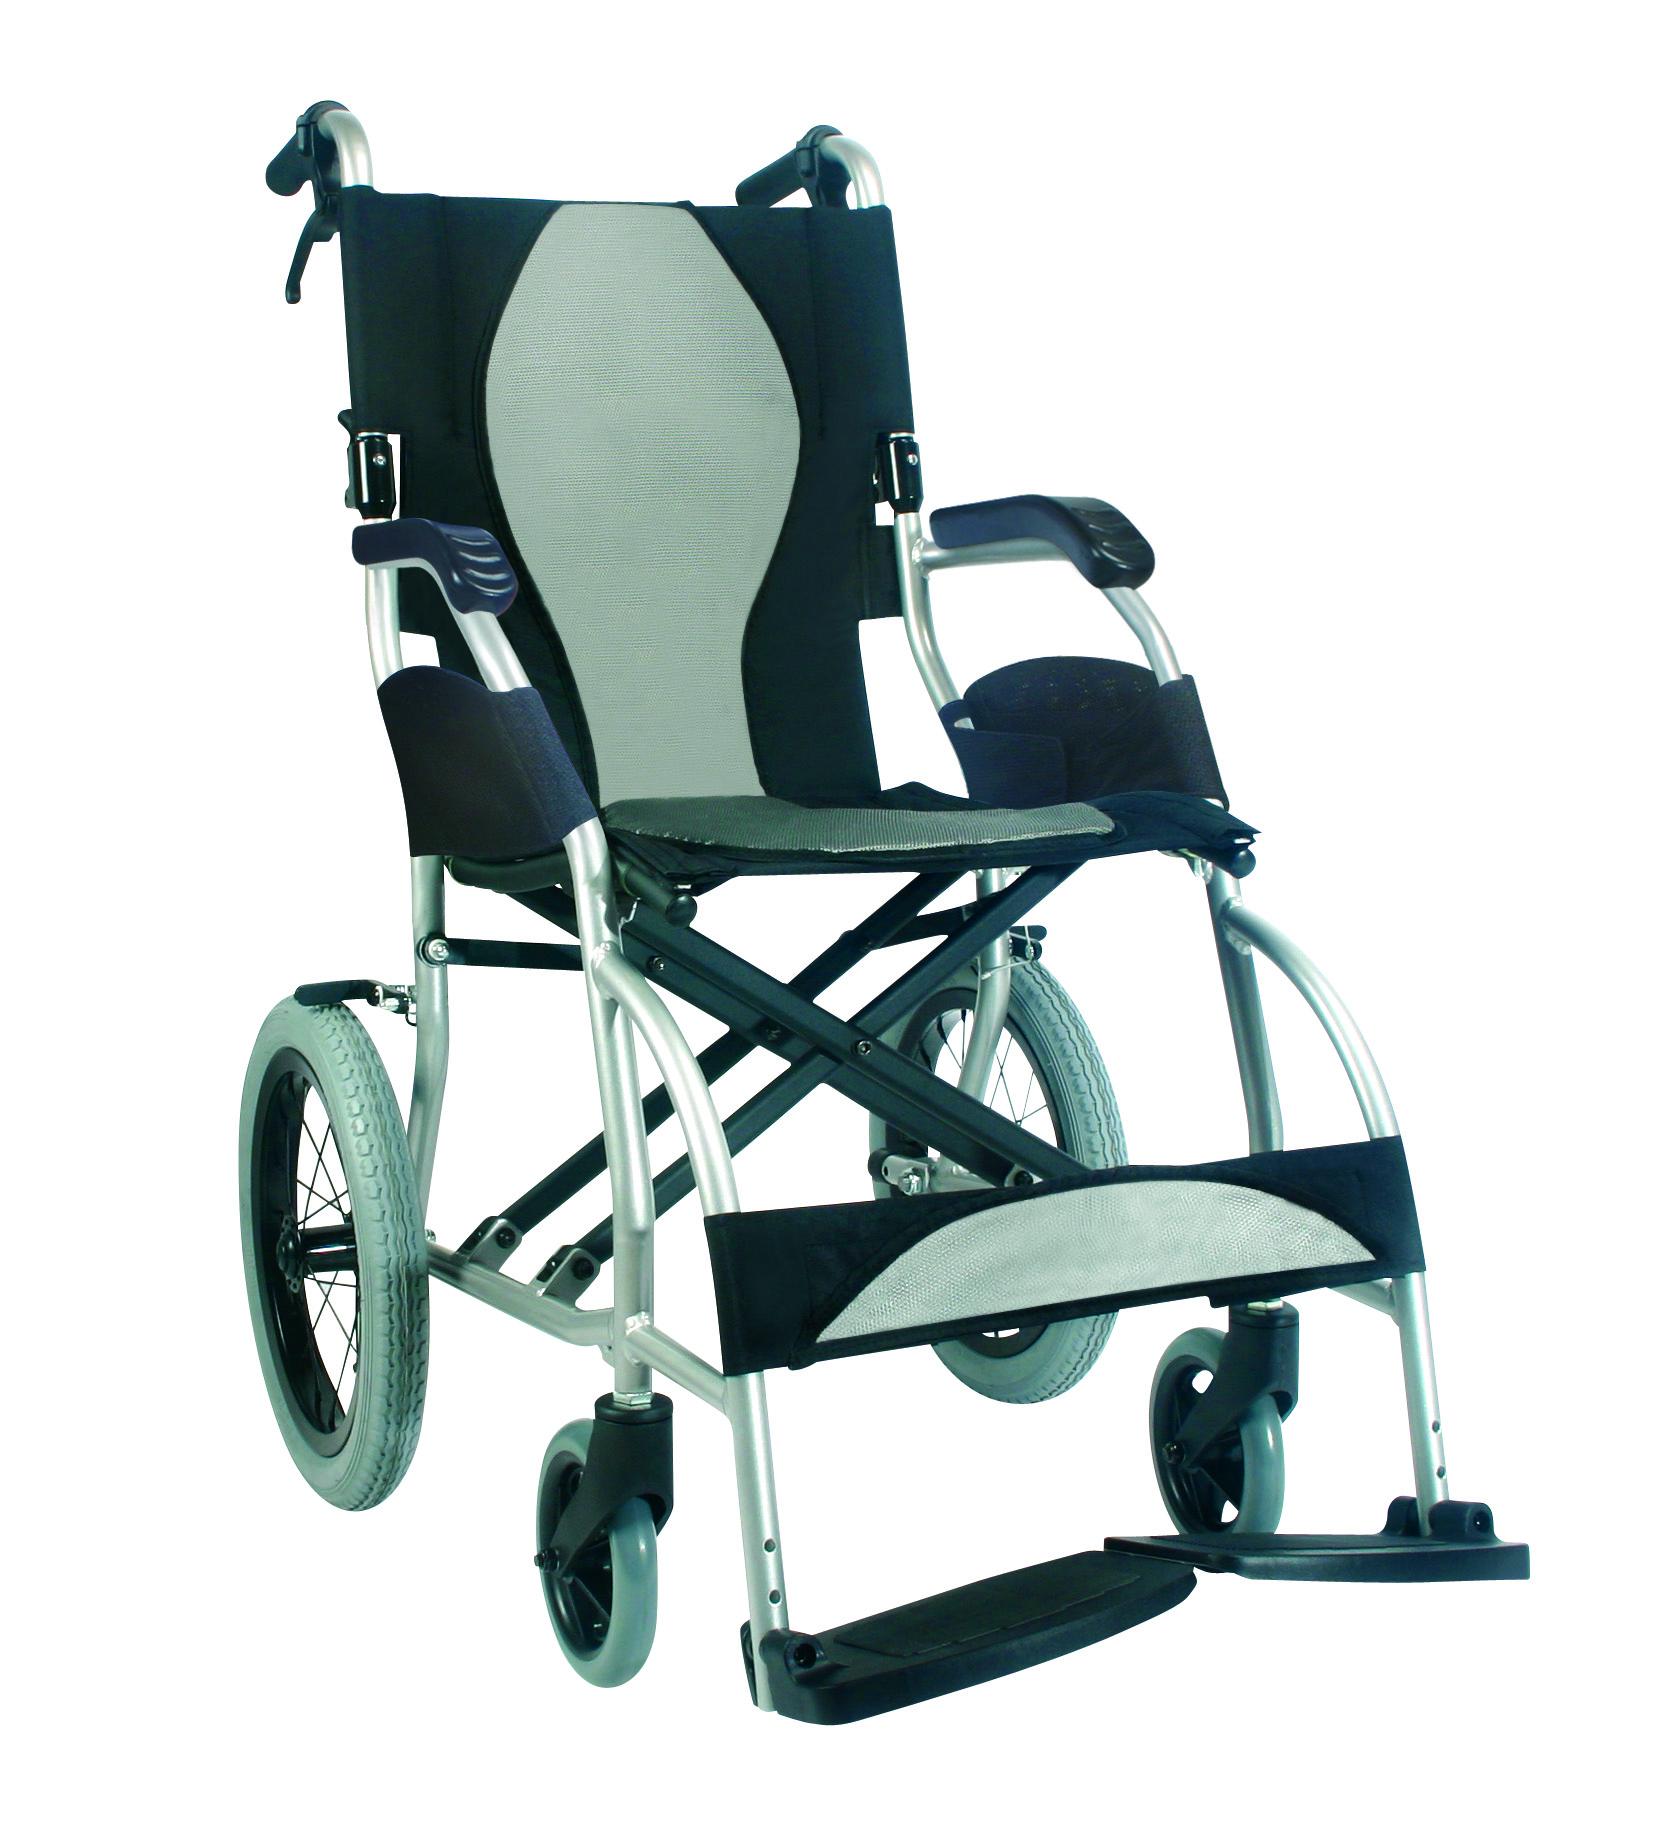 Ergo Lite Transit Wheelchair at Low Prices UK Wheelchairs